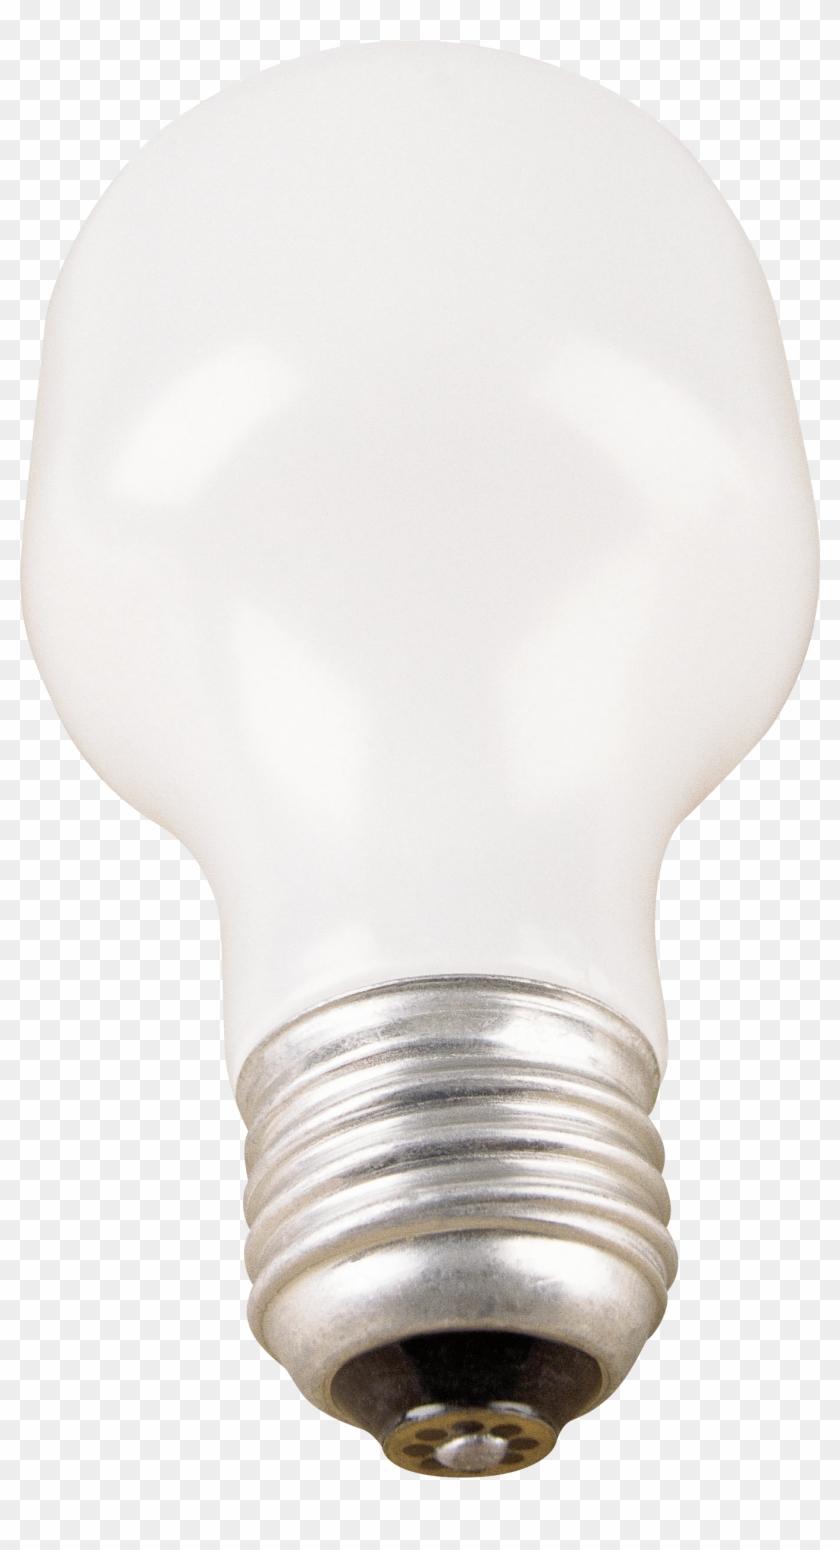 Lamp Png Image - Incandescent Light Bulb Clipart #1812476